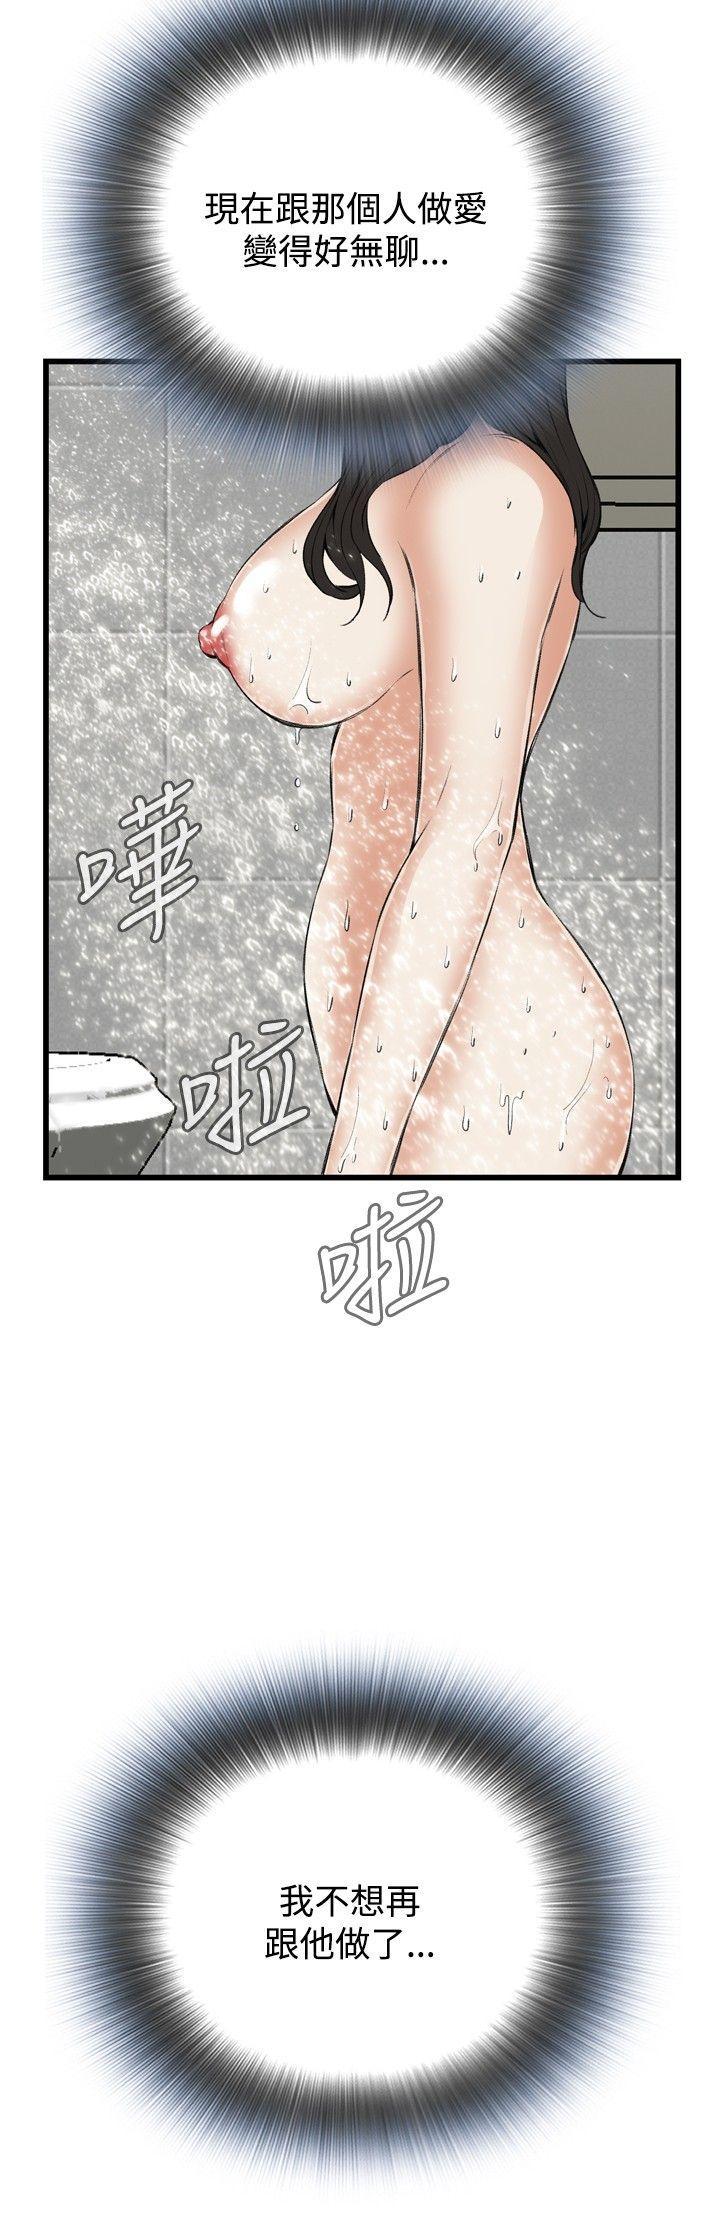 Take a Peek 偷窥 Ch.39~55 [Chinese]中文 496